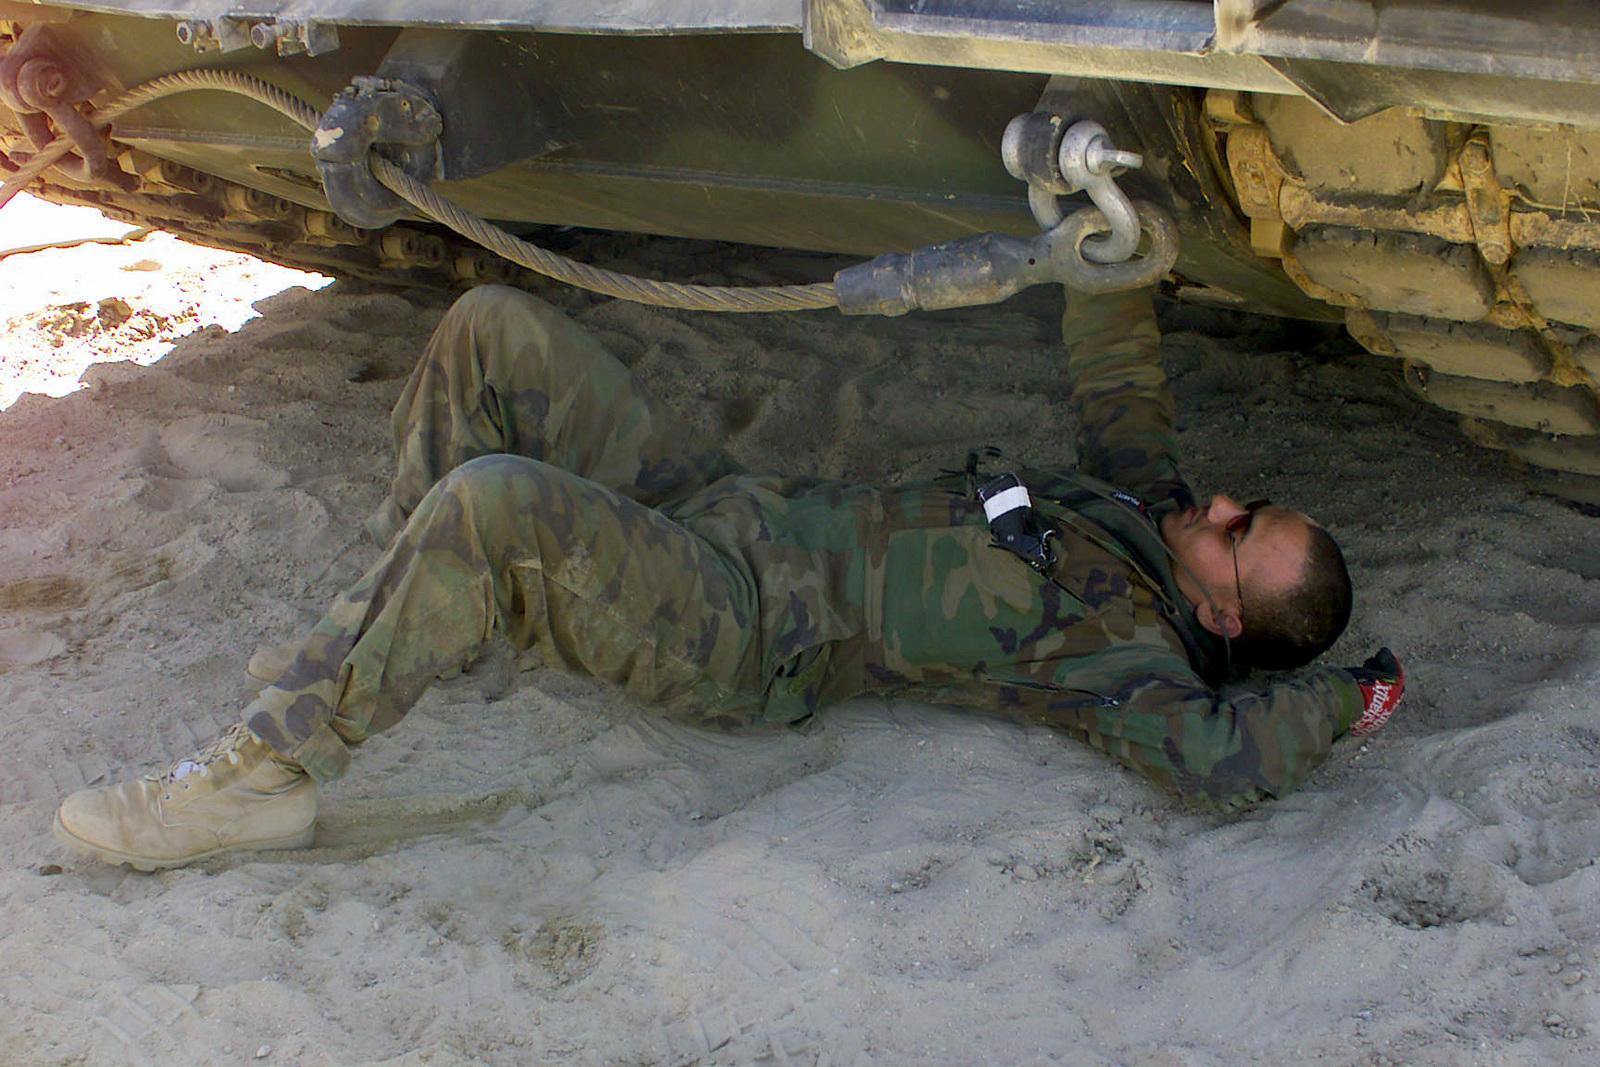 https://nara getarchive net/media/us-air-force-usaf-senior-airman-sra